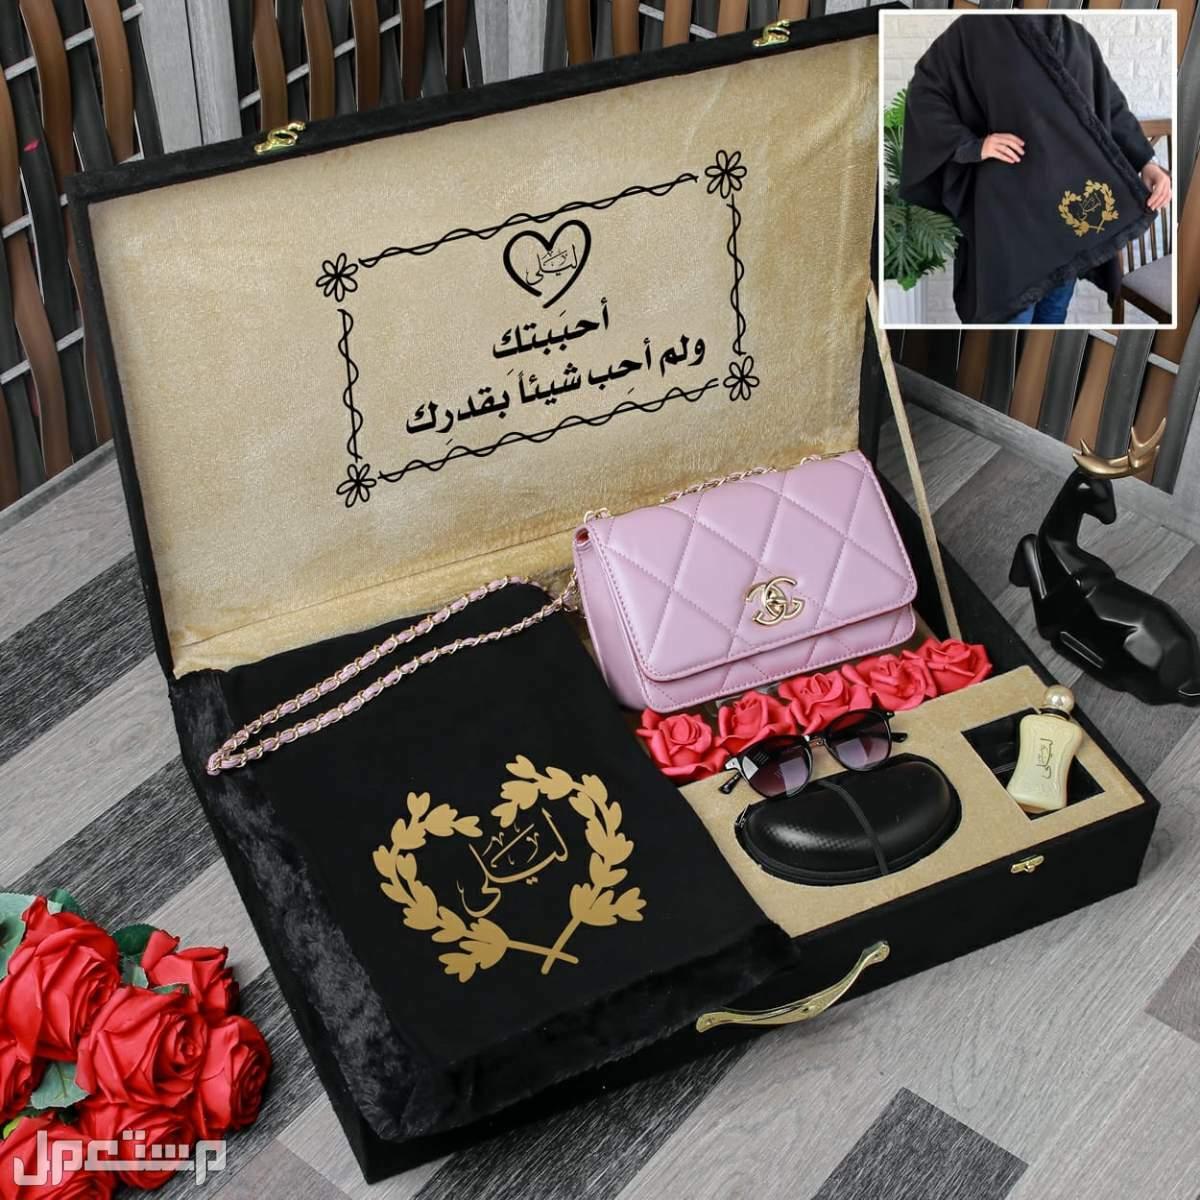 شنط نسائيه مع شوازت عاليه الجوده اهدي هديه لها قيمه